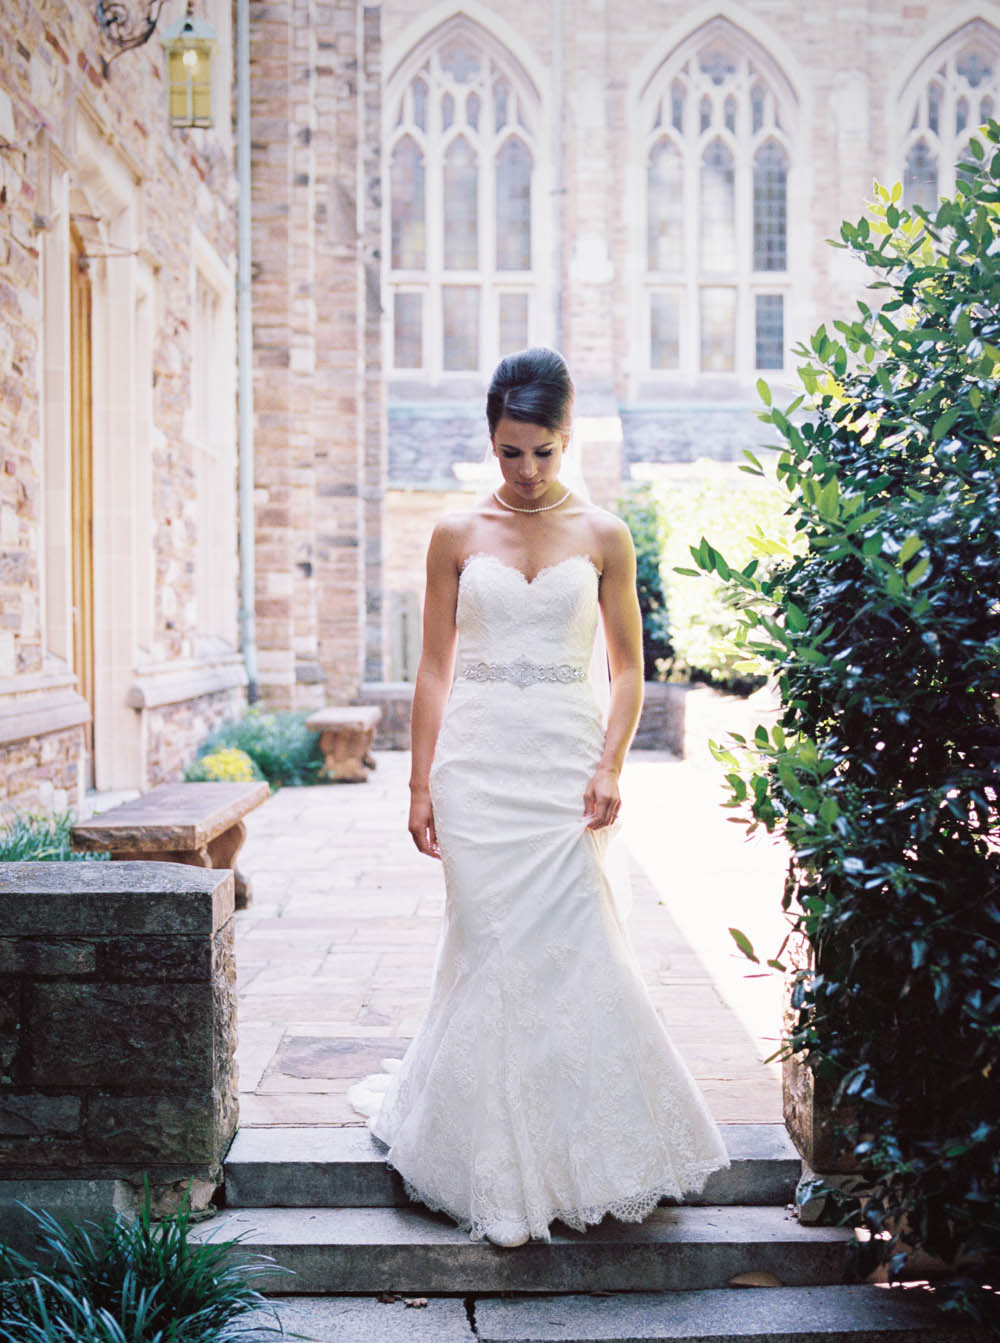 scarritt bennett film wedding photographers documentary natural classic ©2016abigailbobophotography0018.jpg